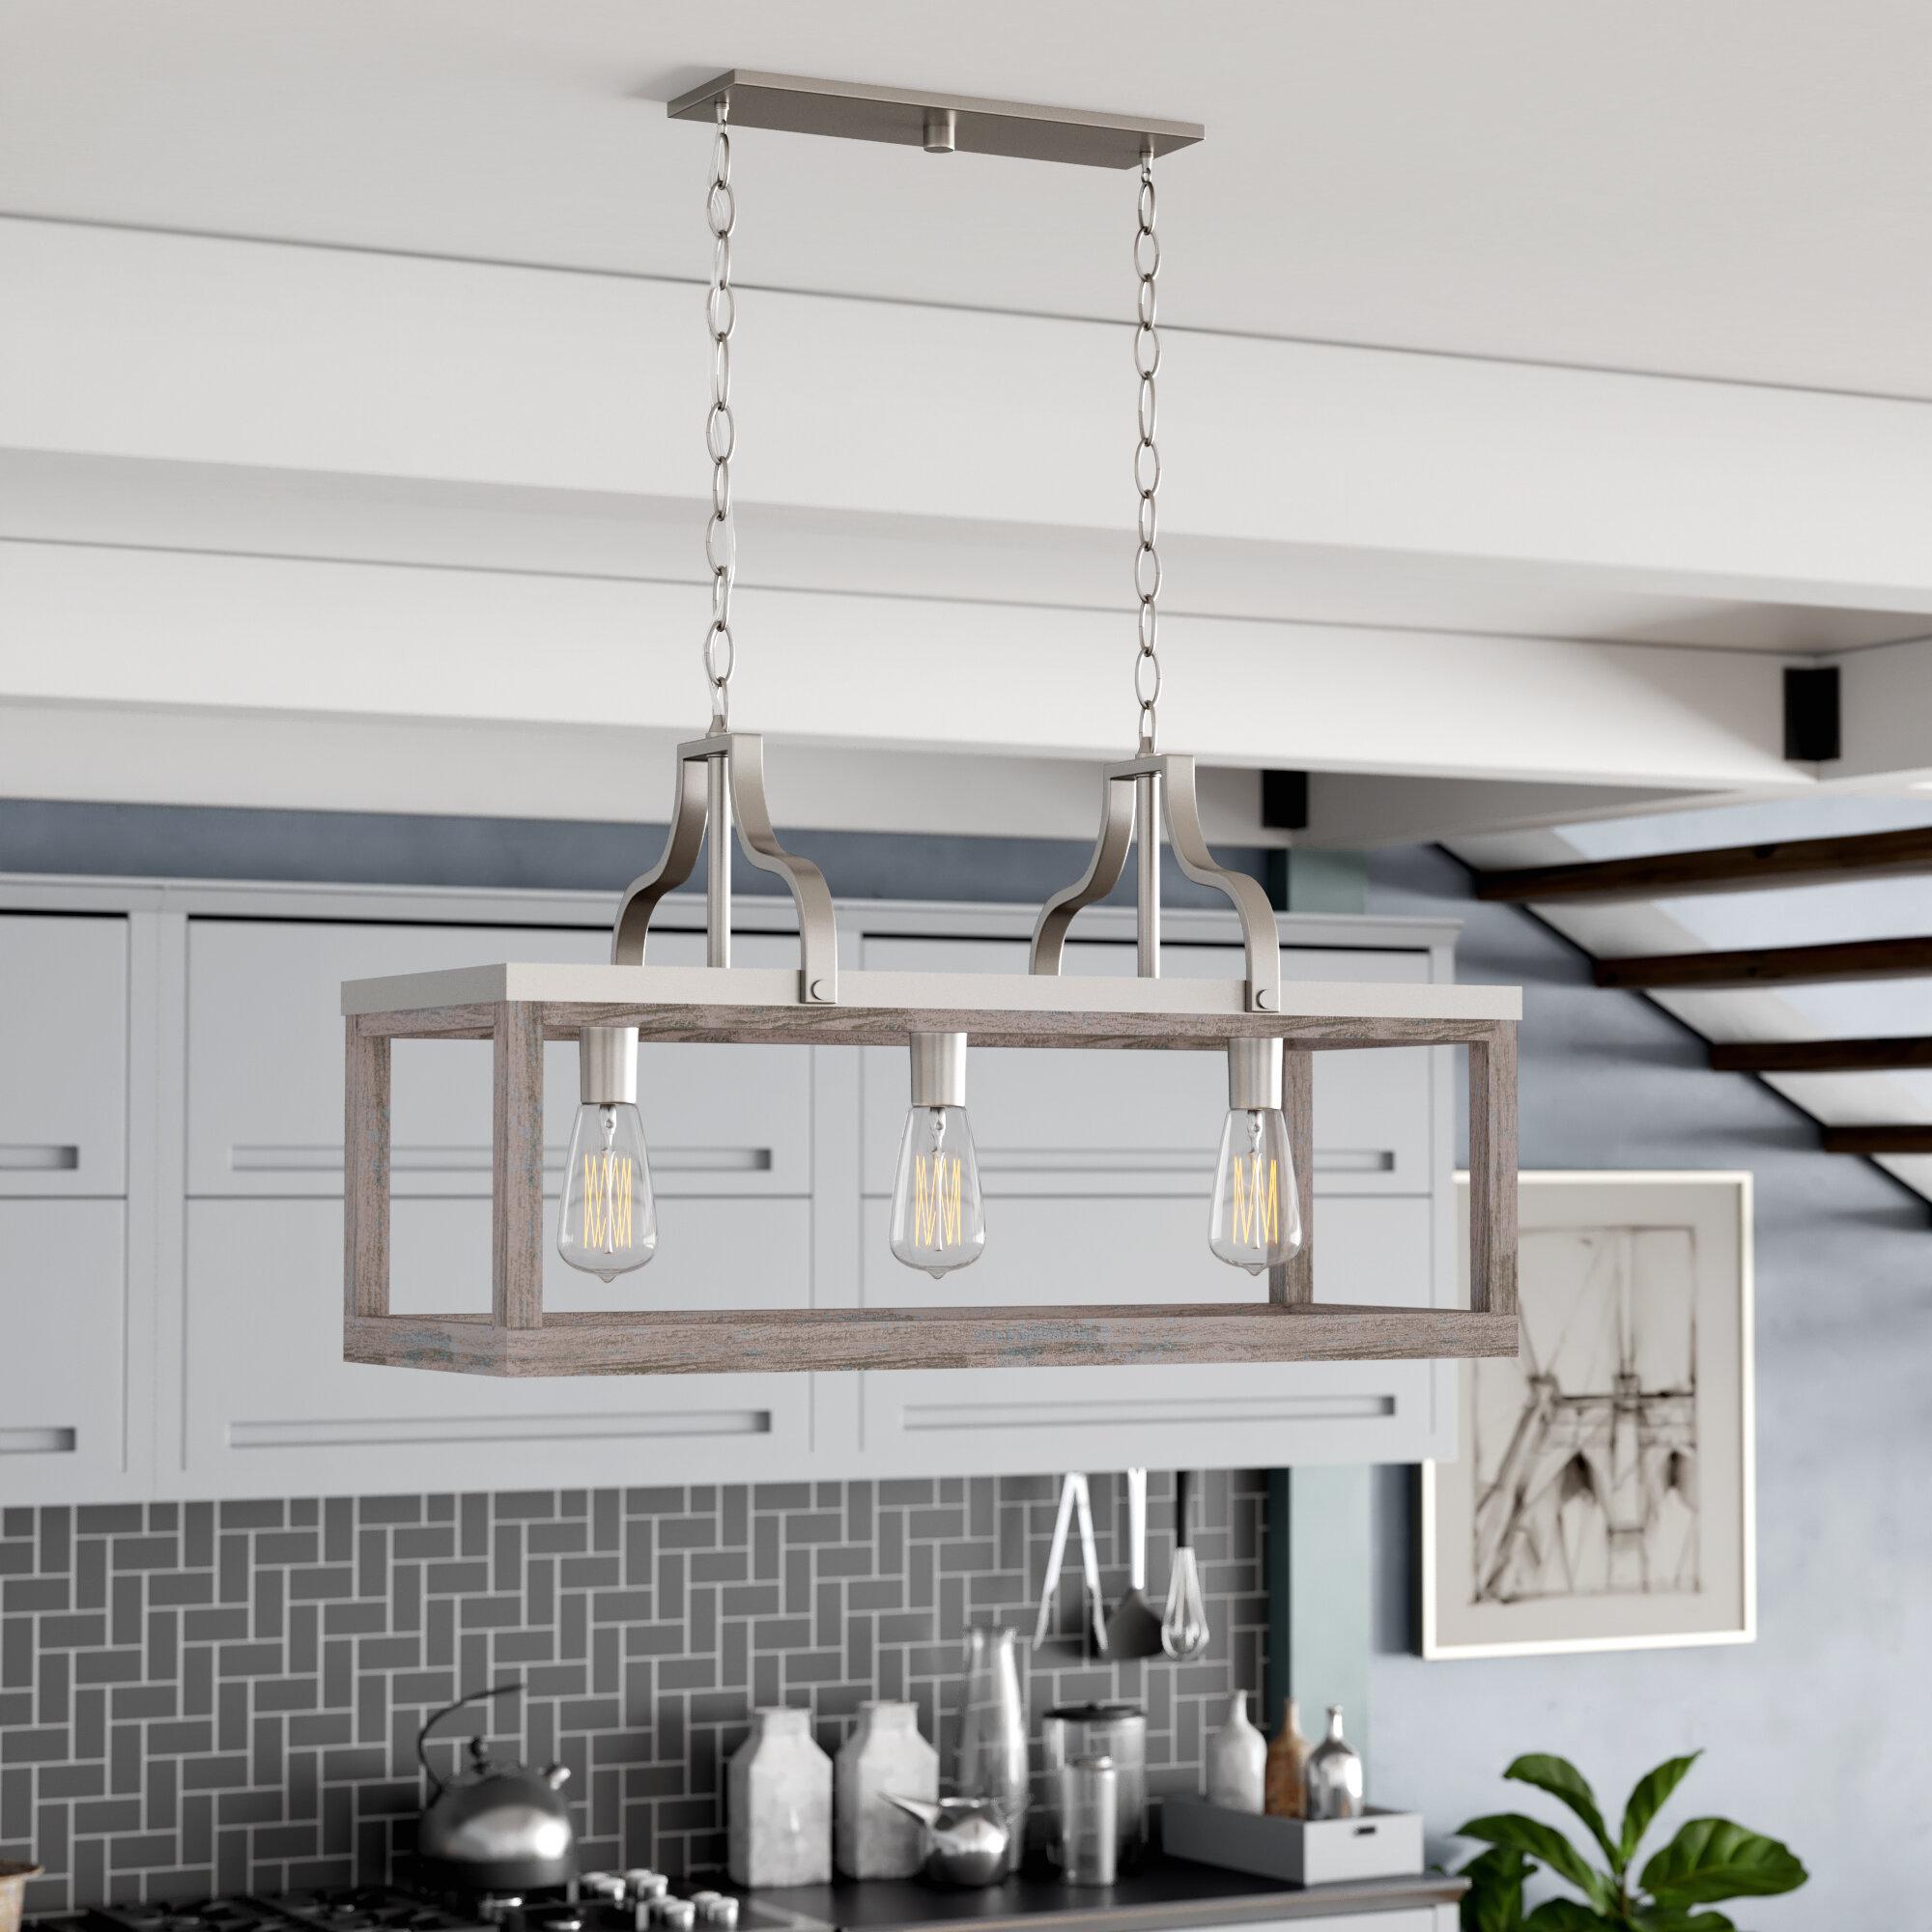 3 Light Linear Kitchen Island Lighting You Ll Love In 2021 Wayfair